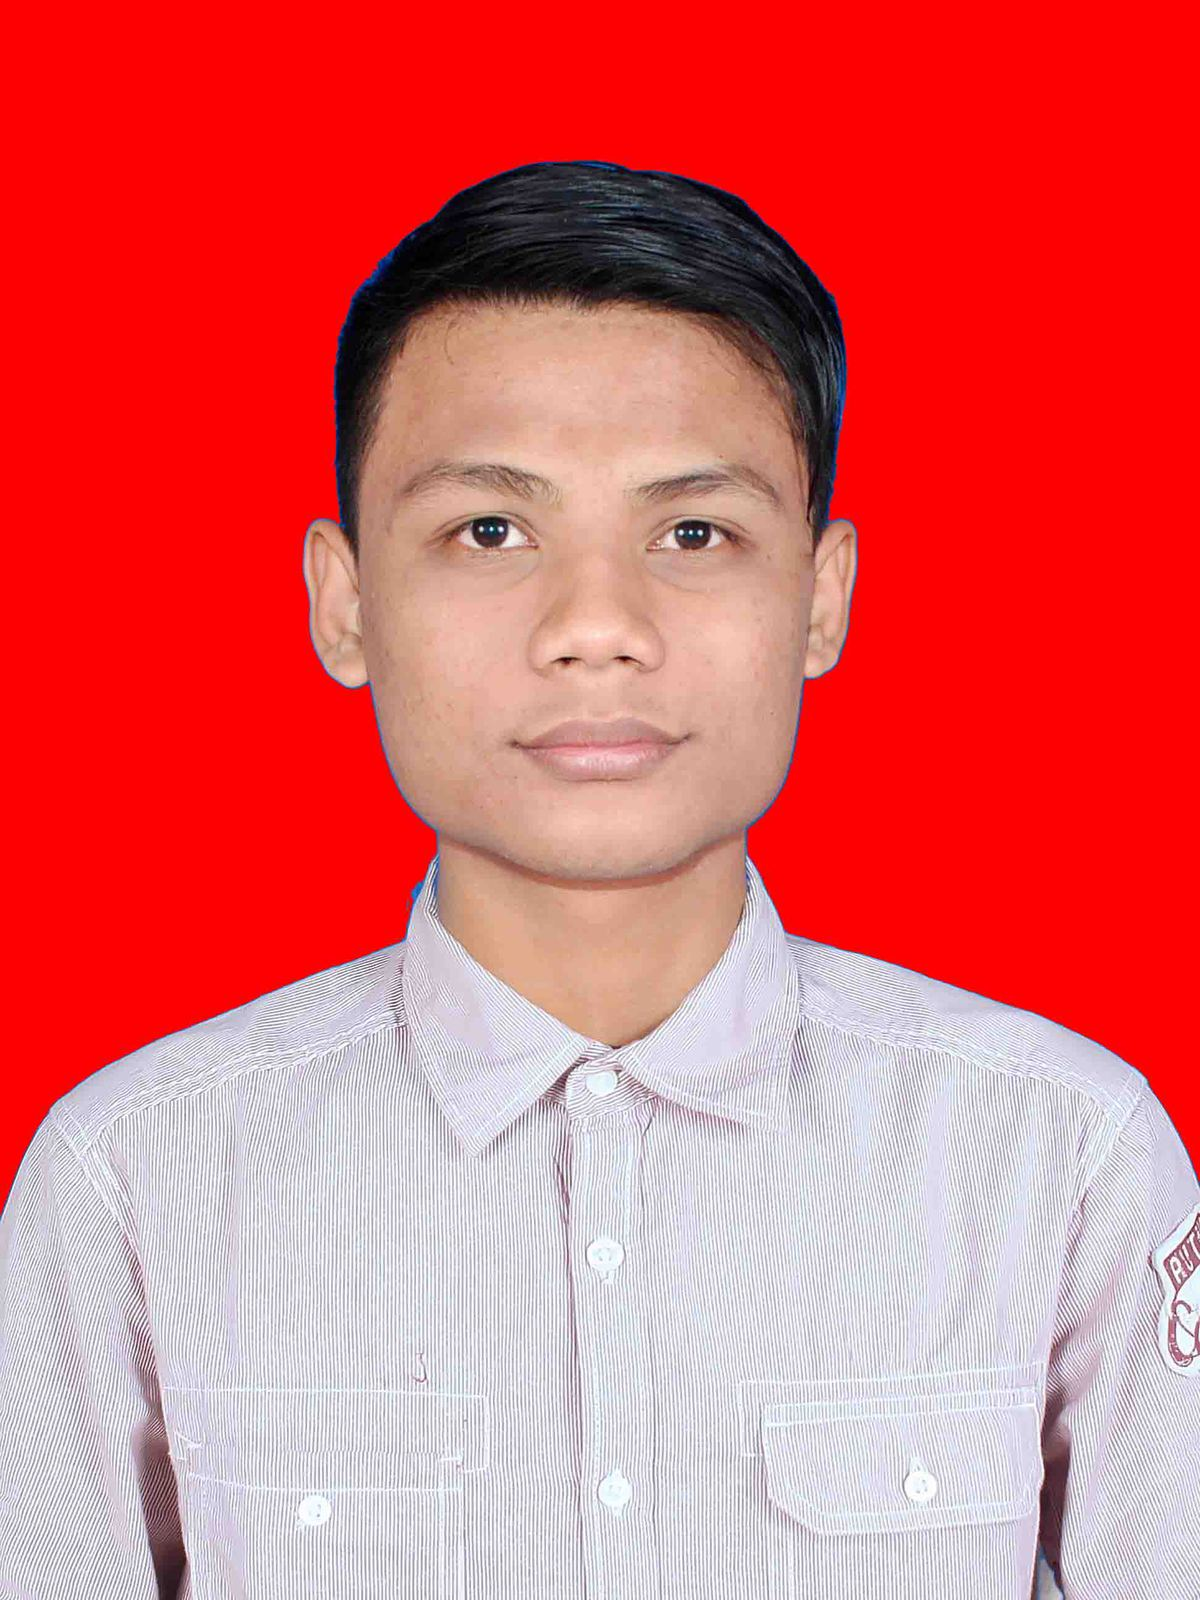 Agung Setiyawan - inglés a indonesio translator